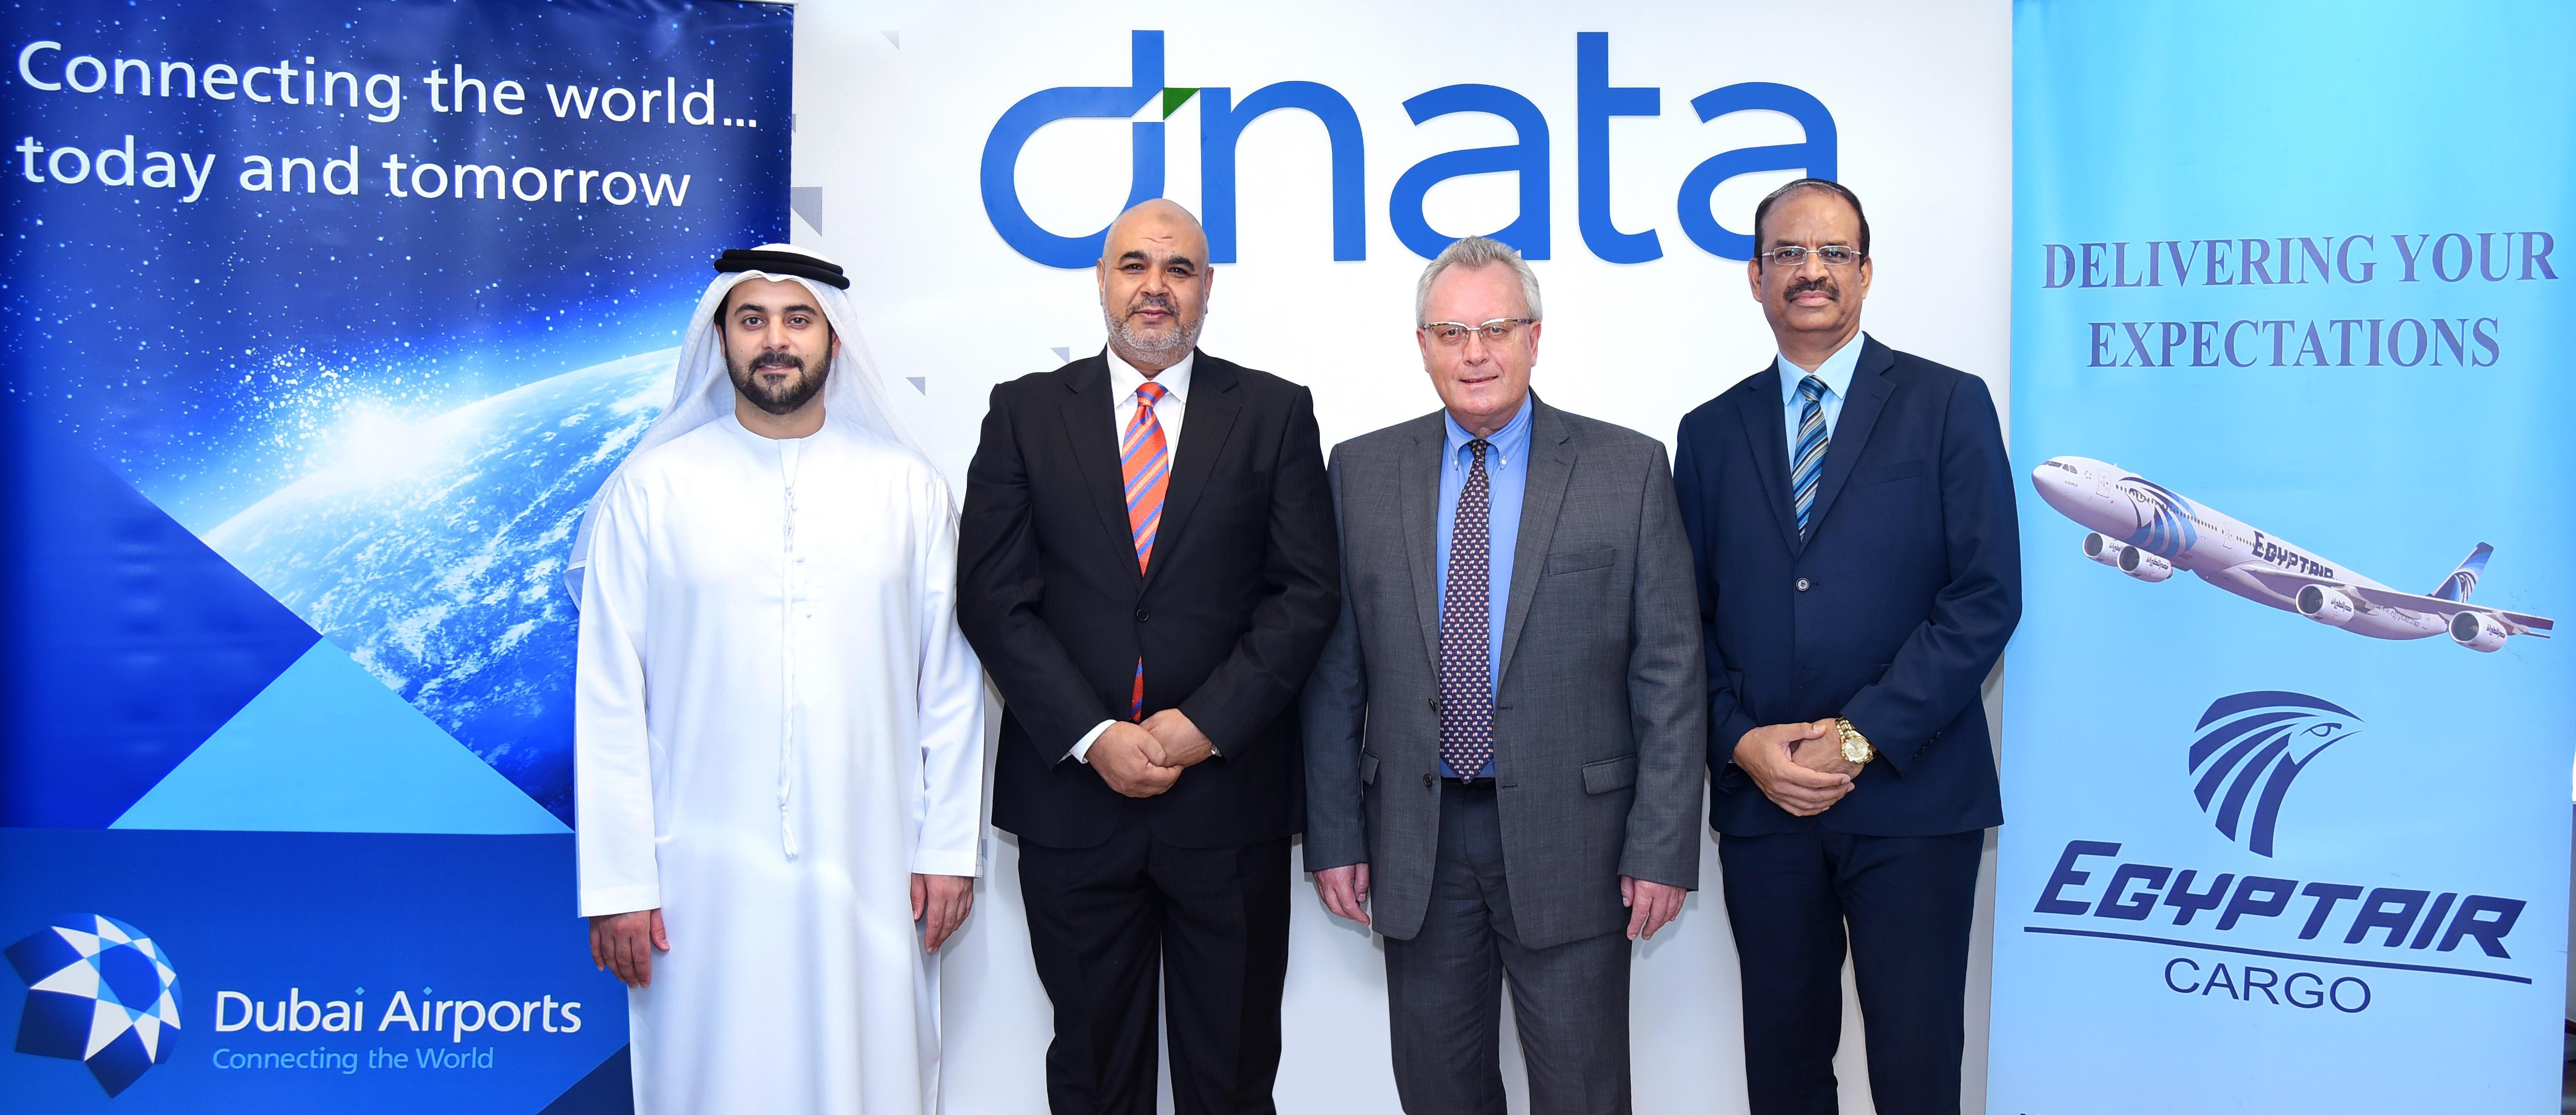 dnata expands partnership with EGYPTAIR in Dubai